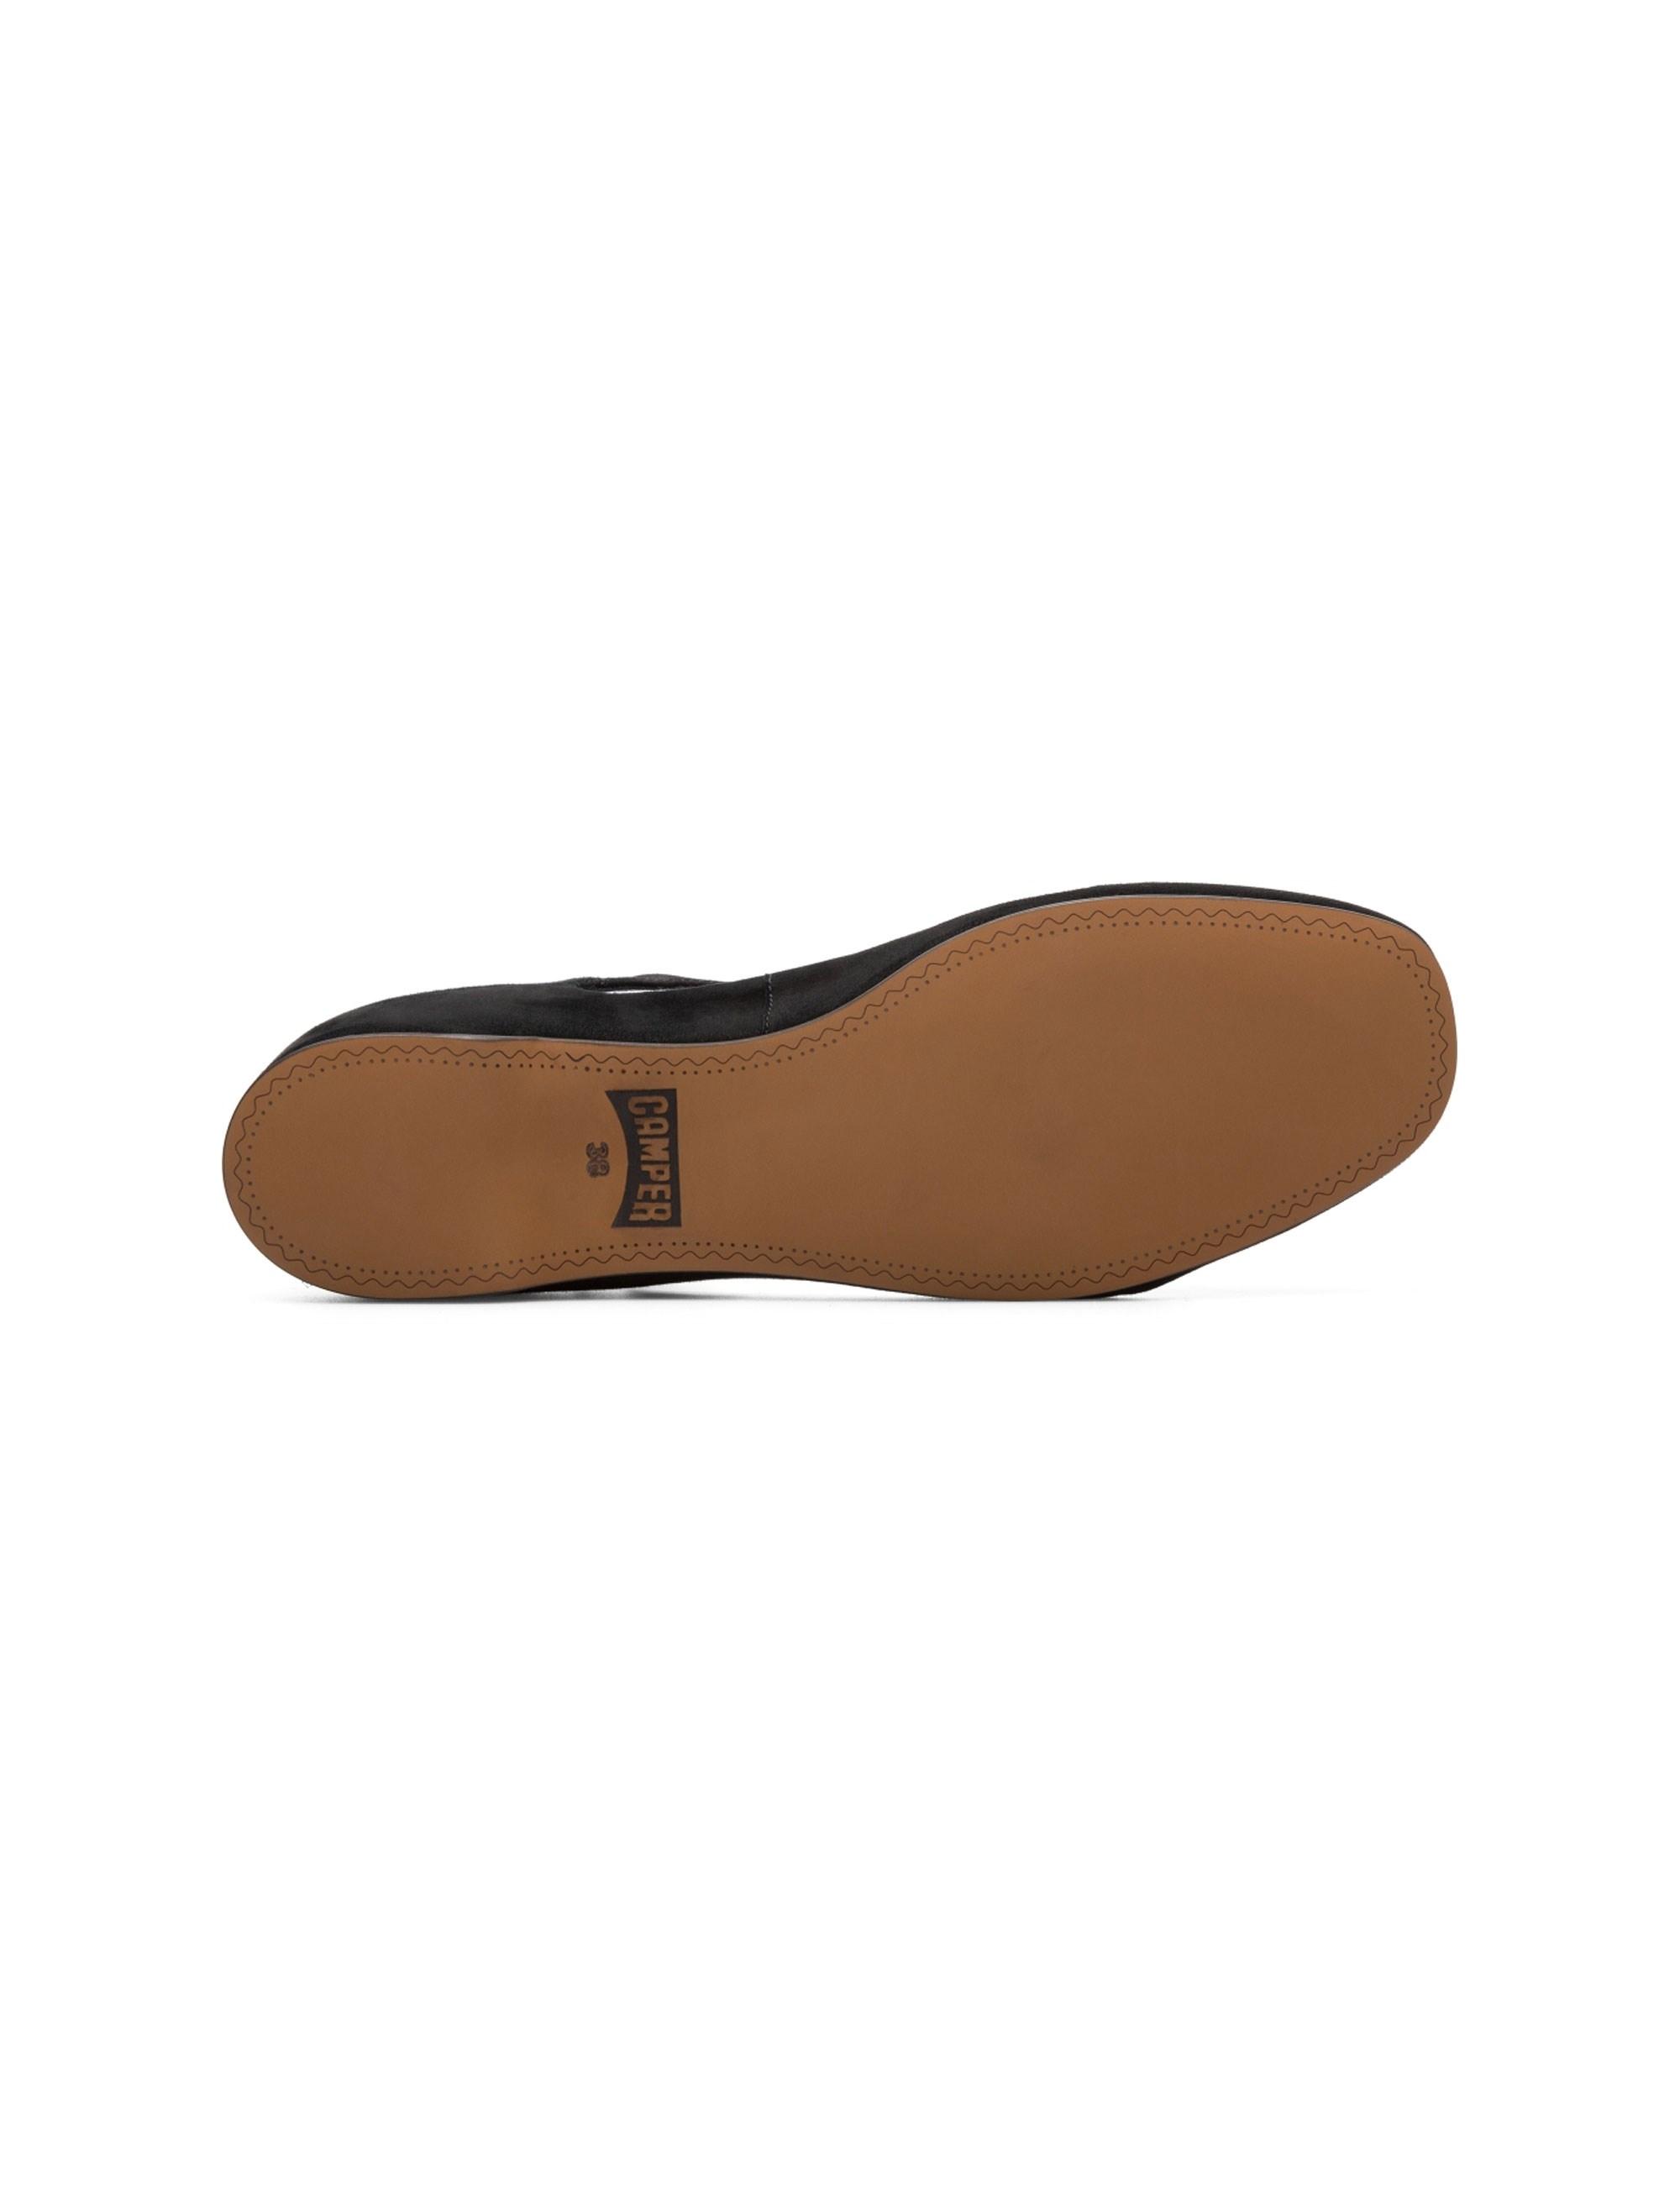 کفش تخت چرم زنانه Lucy - مشکي - 5